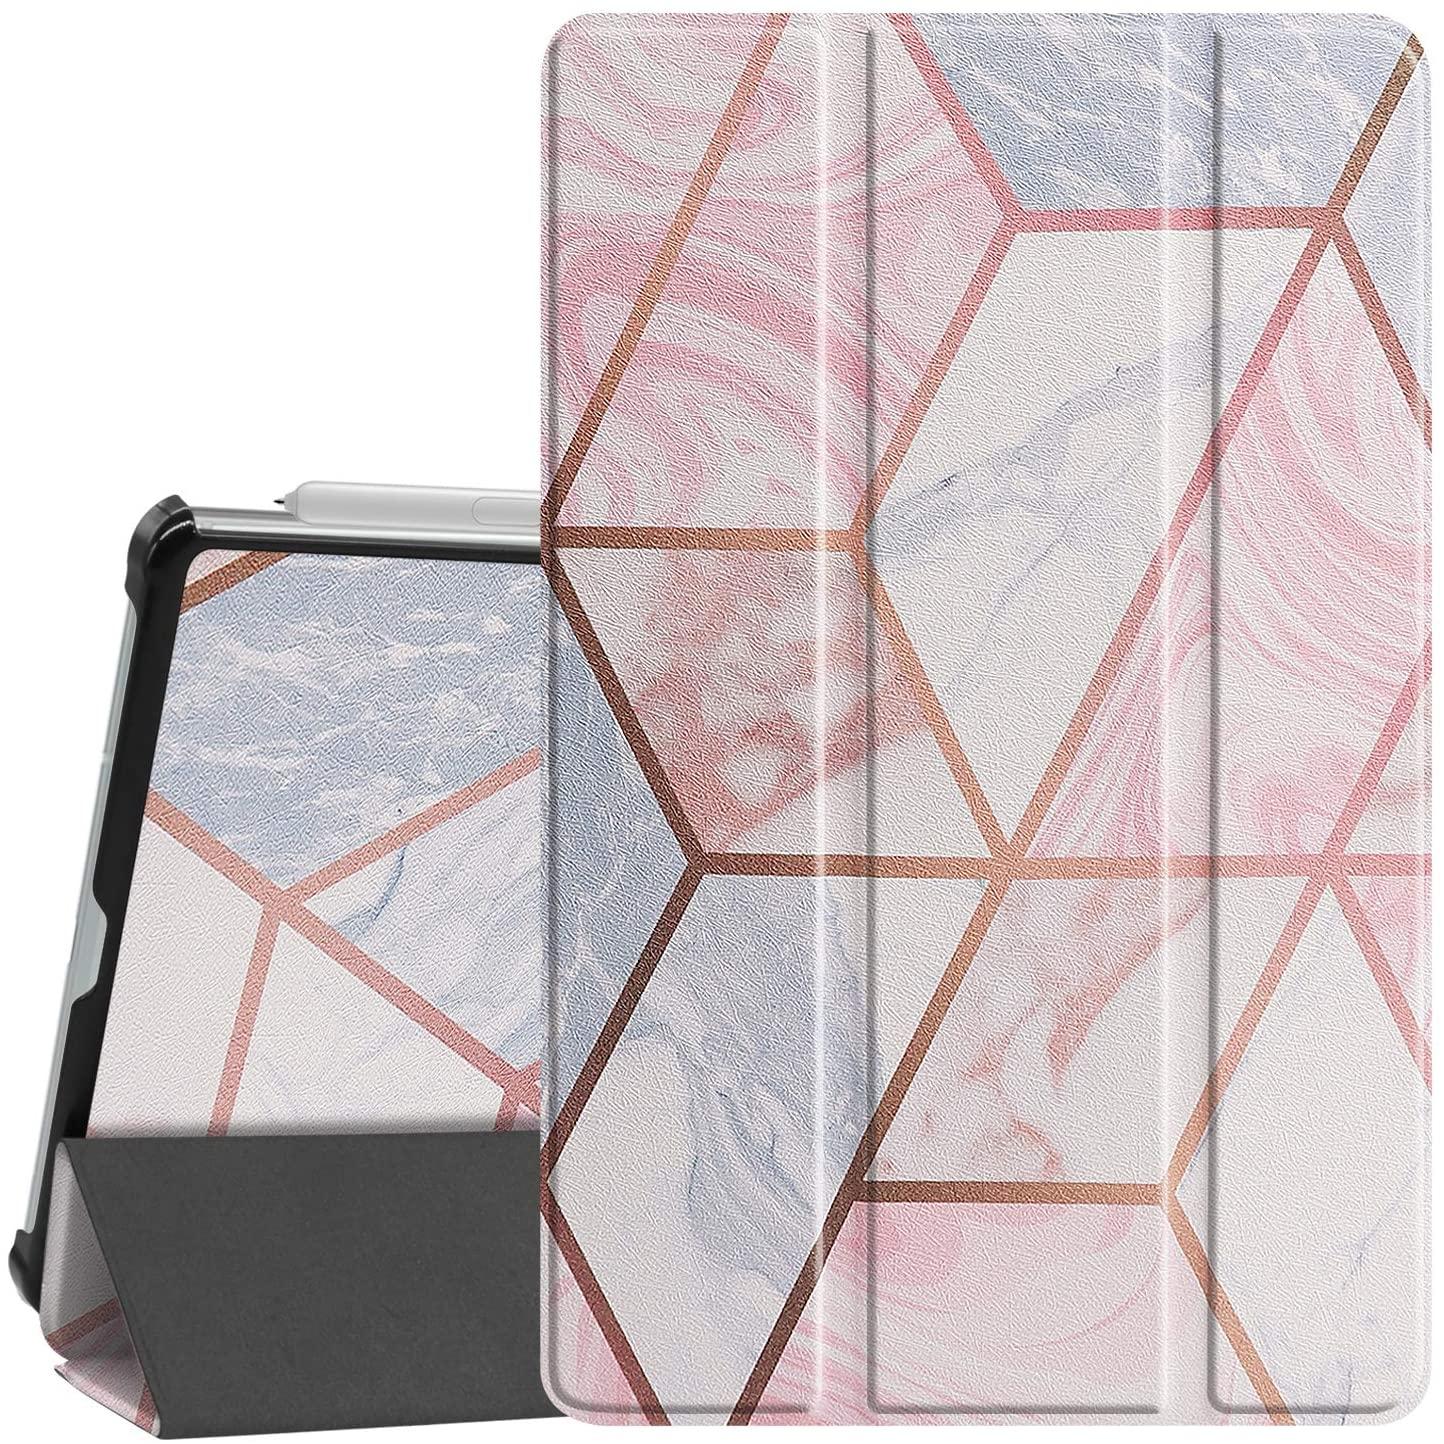 Gylint Samsung Galaxy Tab S6 Lite Case, Smart Case Trifold Stand Slim Lightweight Case Cover with Auto Sleep/Wake for Samsung Galaxy Tab S6 Lite 10.4 Inches SM-P610 (Wi-Fi); SM-P615 (LTE) Geometric